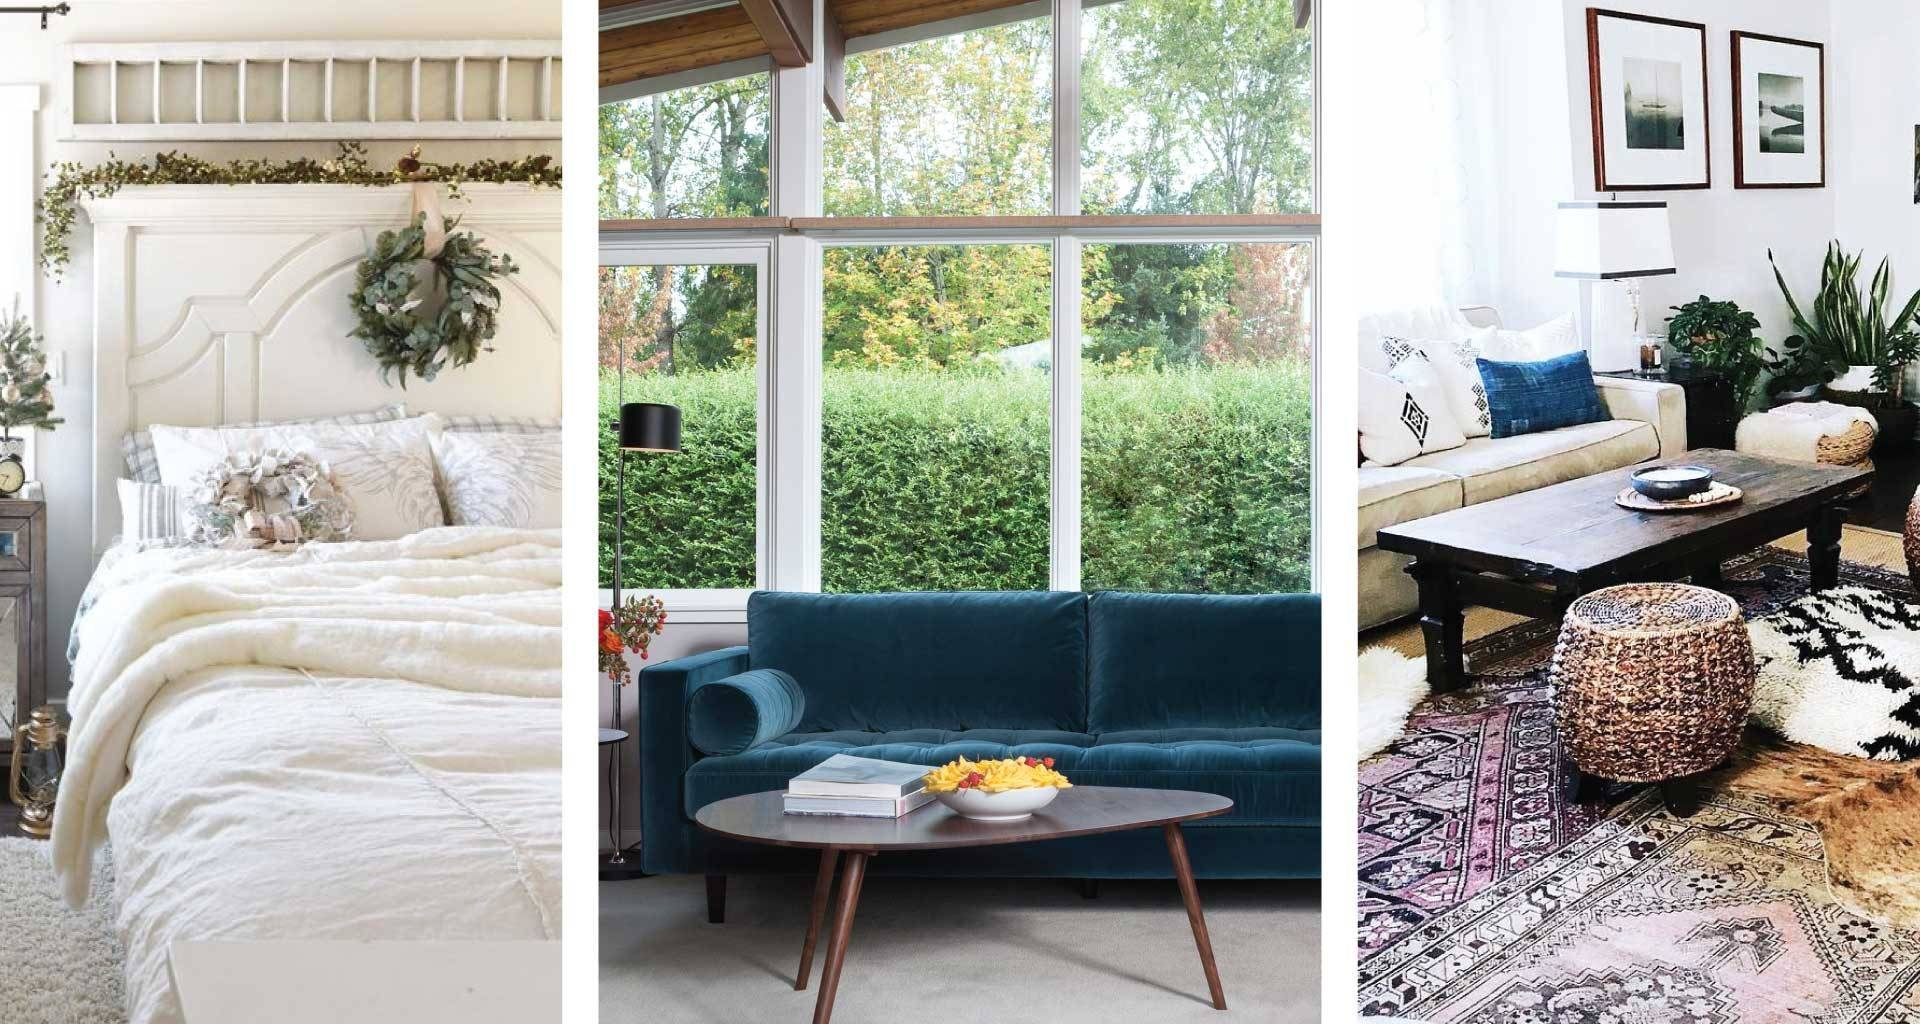 Interior Design Styles 10 Popular Types Explained 1920x1024